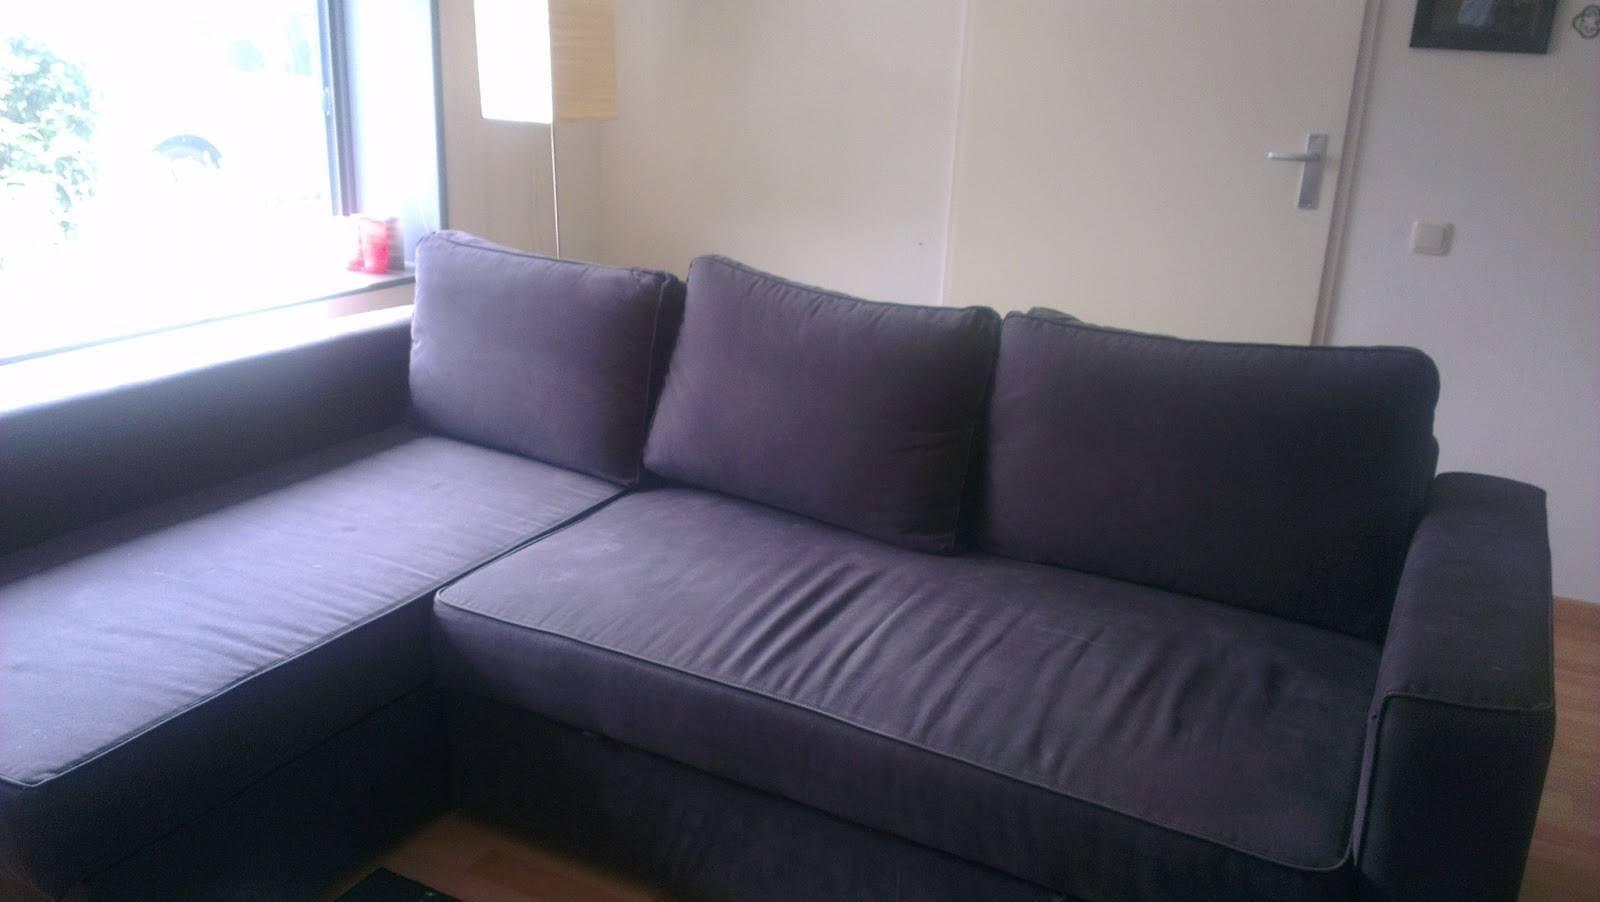 Ace The Adventure: Ikea Vrijdag: Manstad Bank/sofa with regard to Manstad Sofa Bed Ikea (Image 1 of 25)